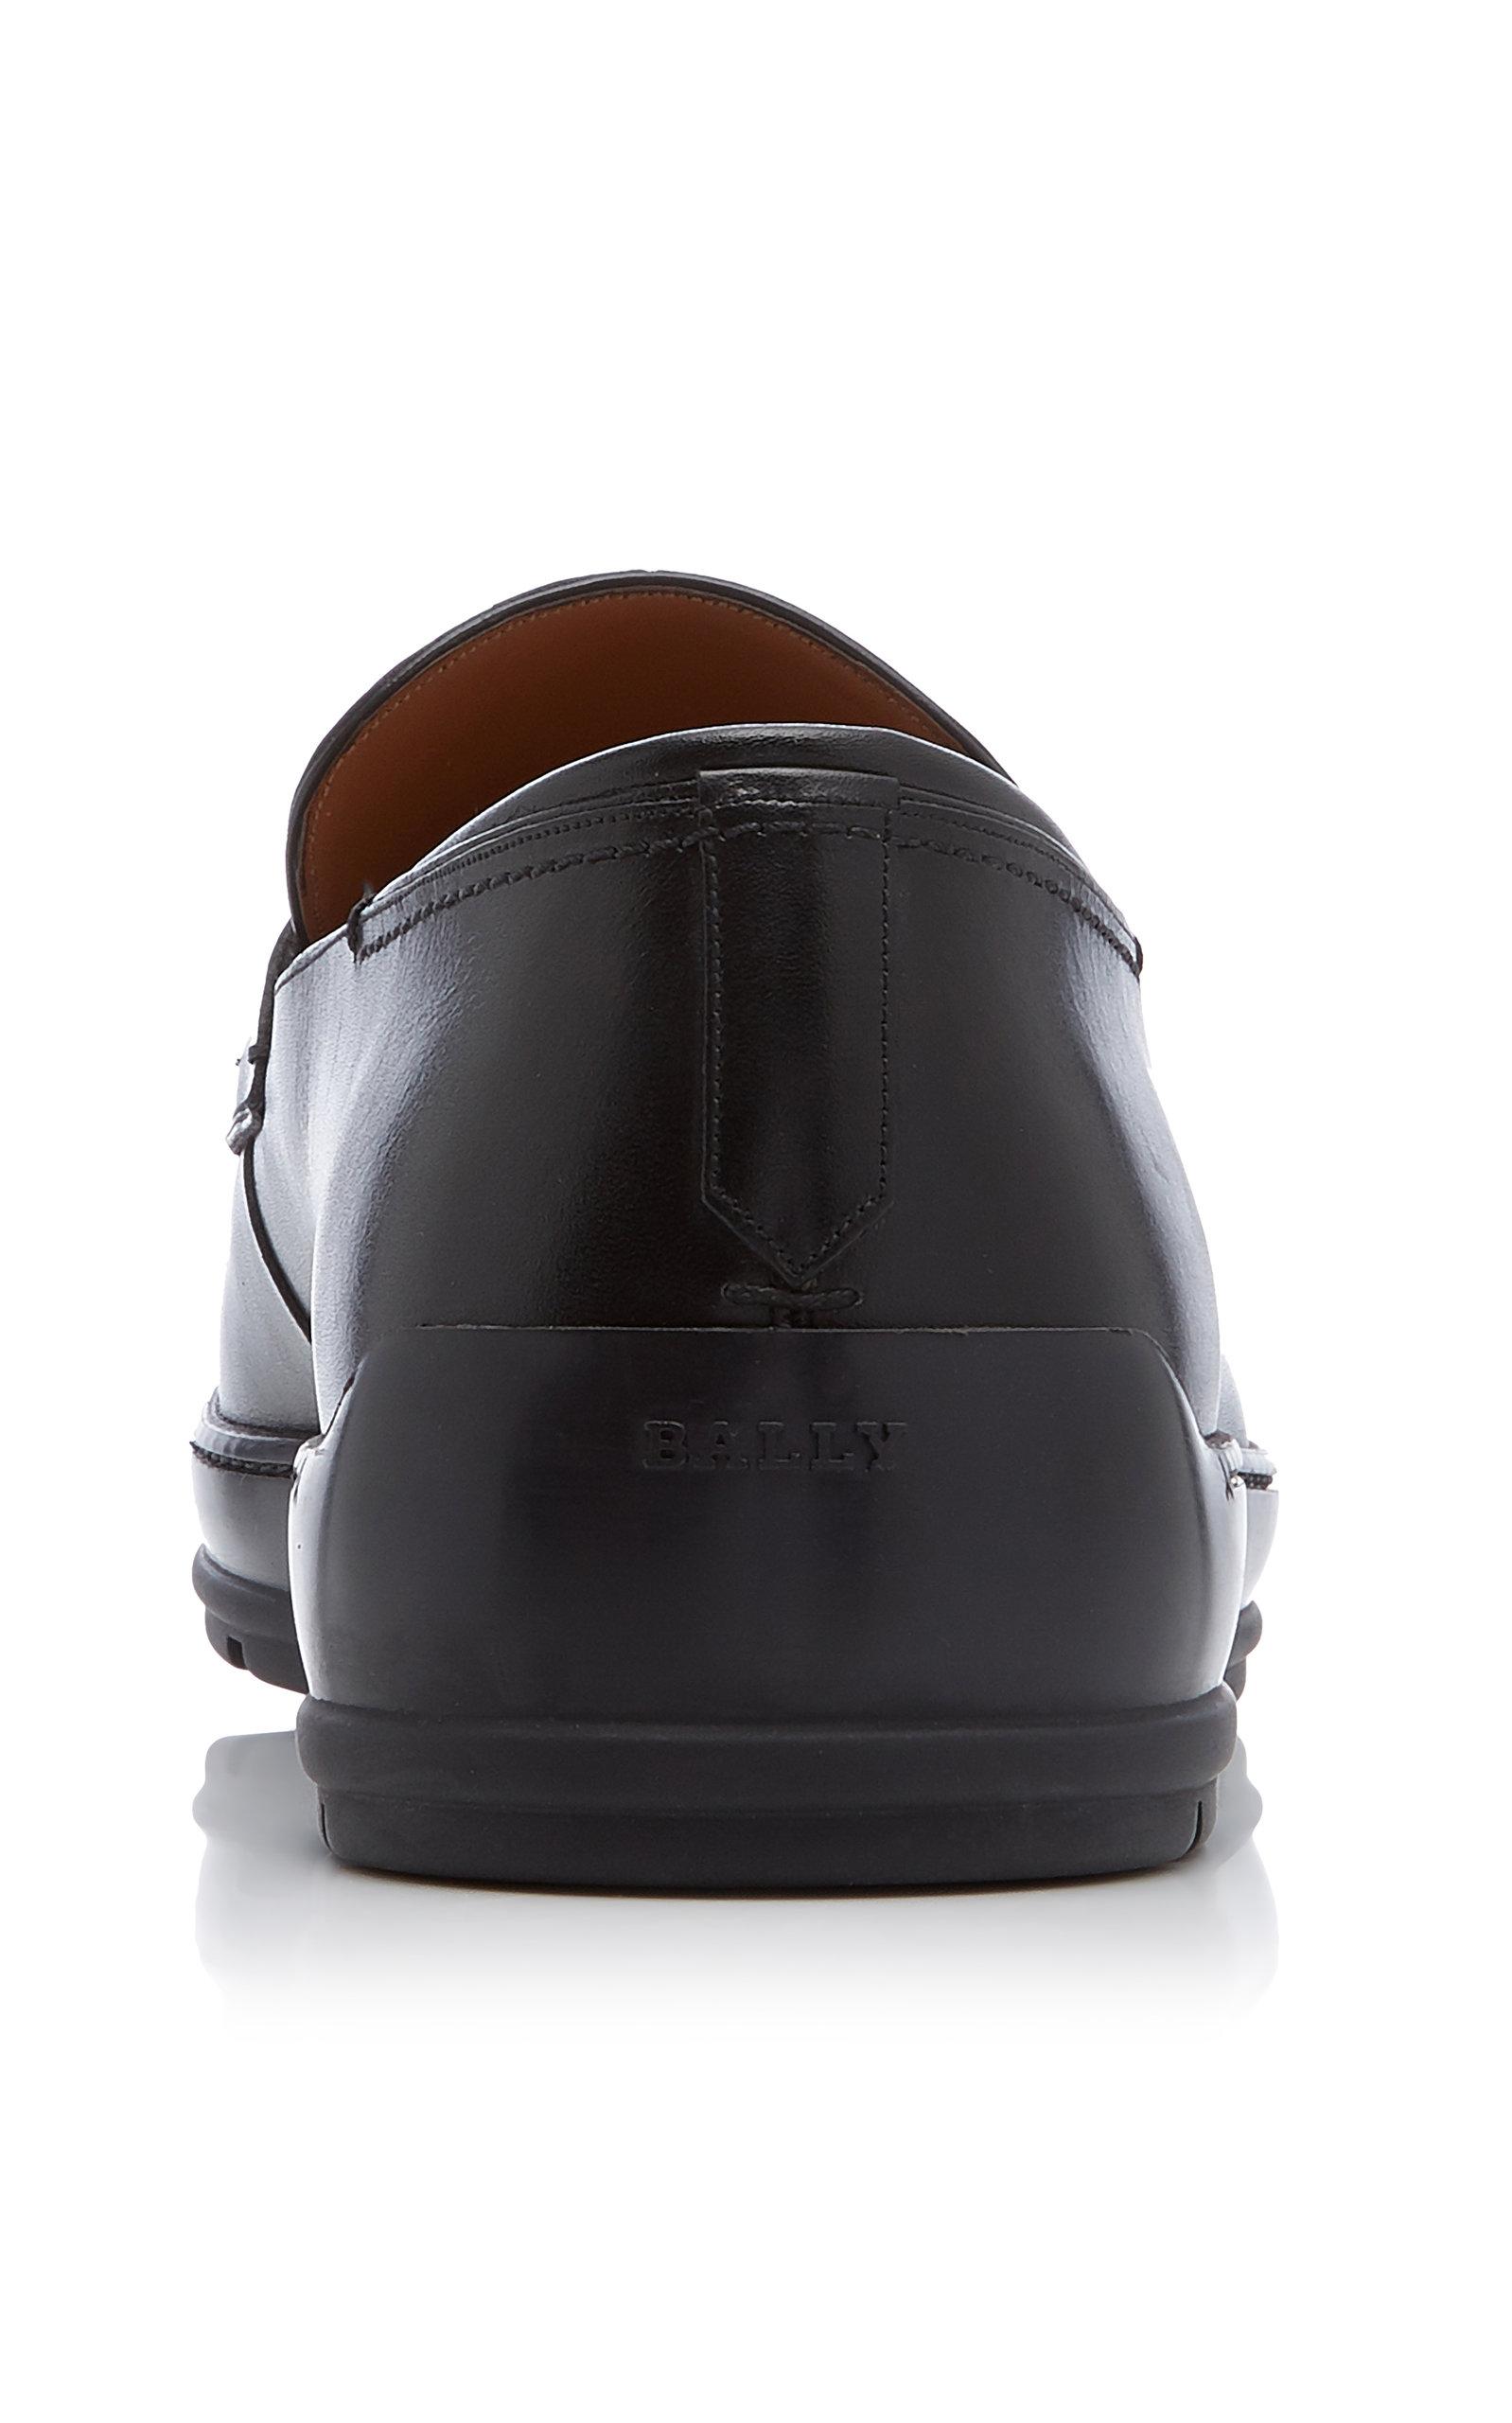 e0f034502f1 BallyRelon Leather Penny Loafers. CLOSE. Loading. Loading. Loading. Loading